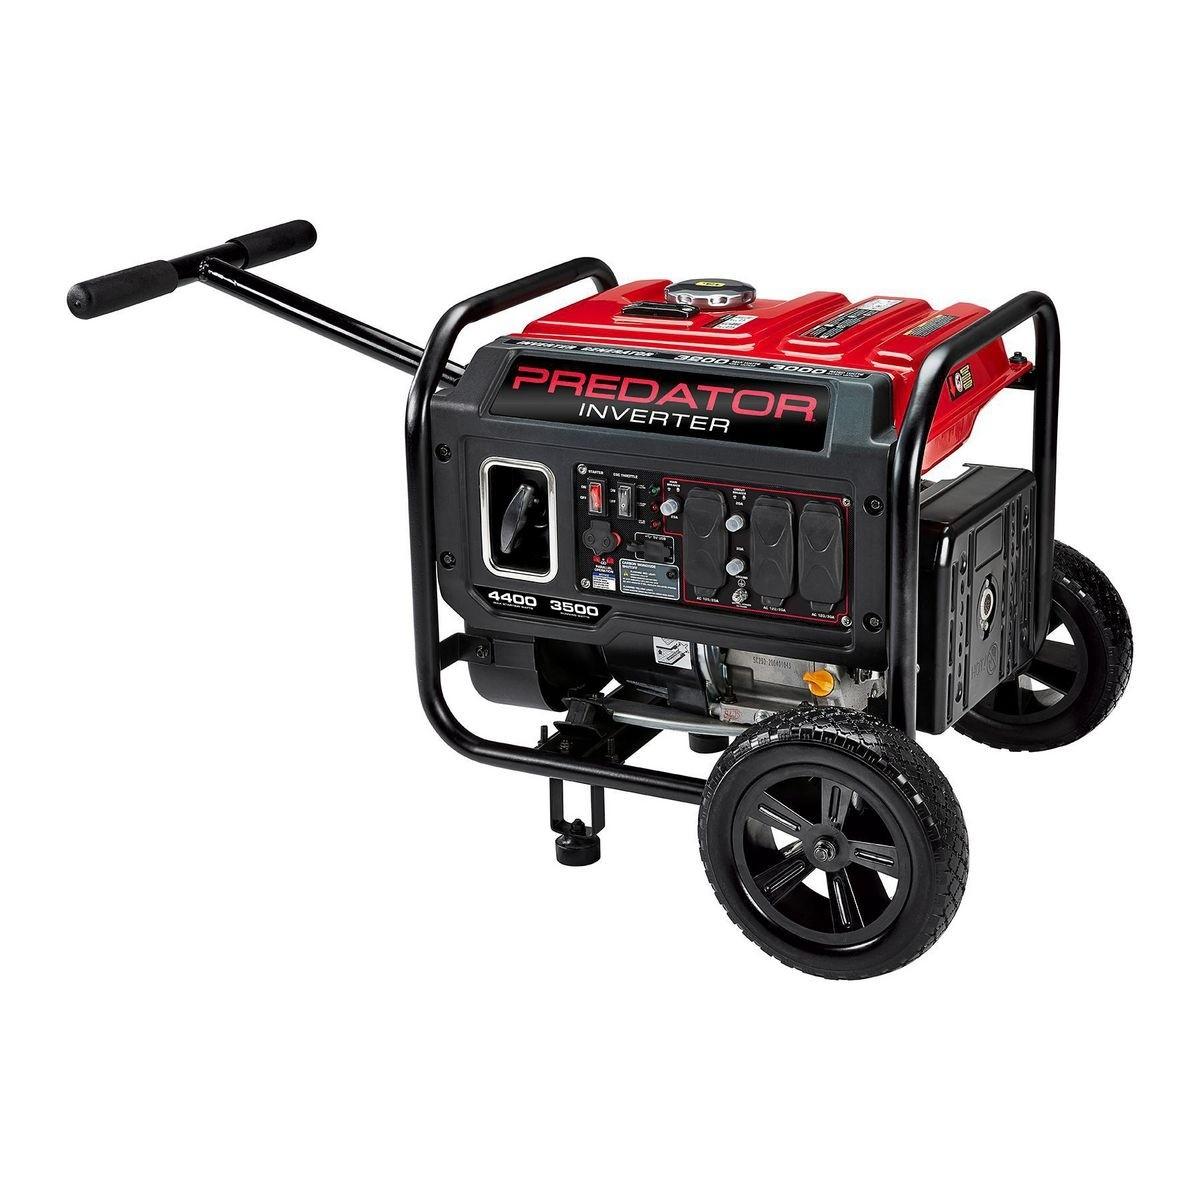 PREDATOR 4400 Watt Inverter Generator With CO SECURE™ - EPA III – Item 57509